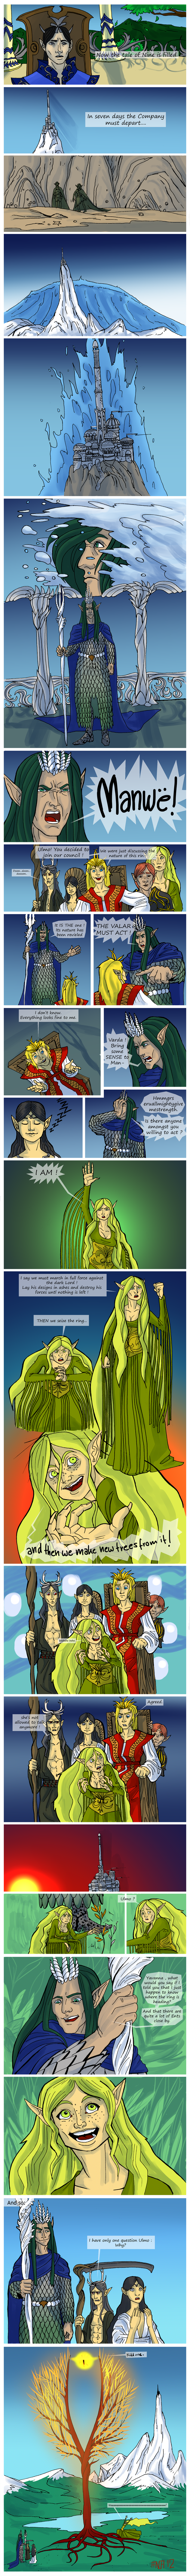 The Valars council by DahmsArmageddon